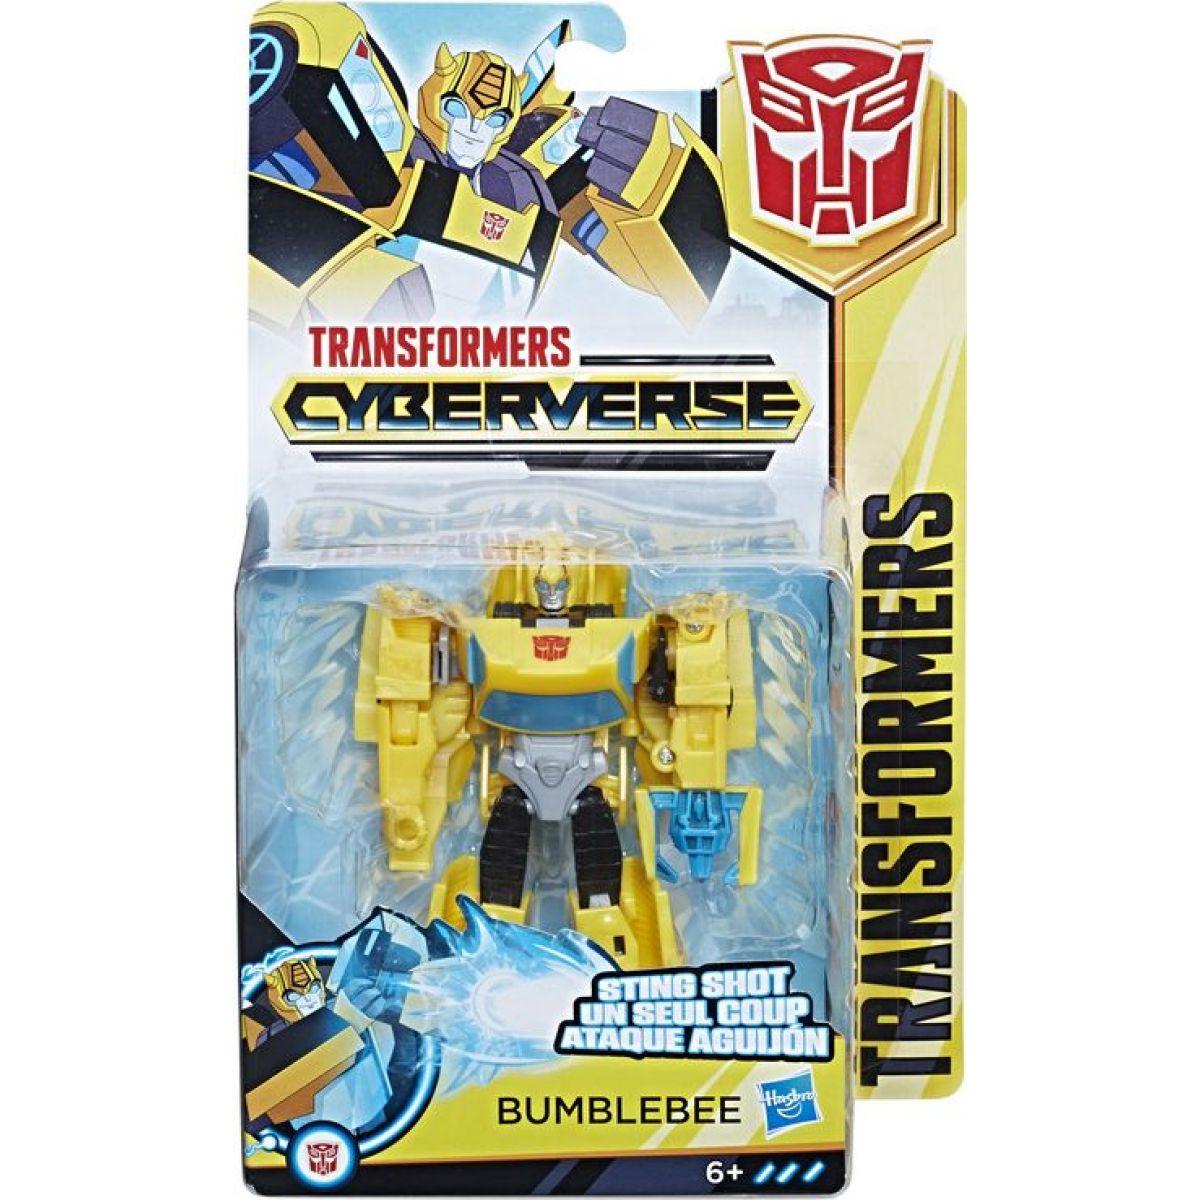 Hasbro Transformers Action attacker 15 Bumblebee